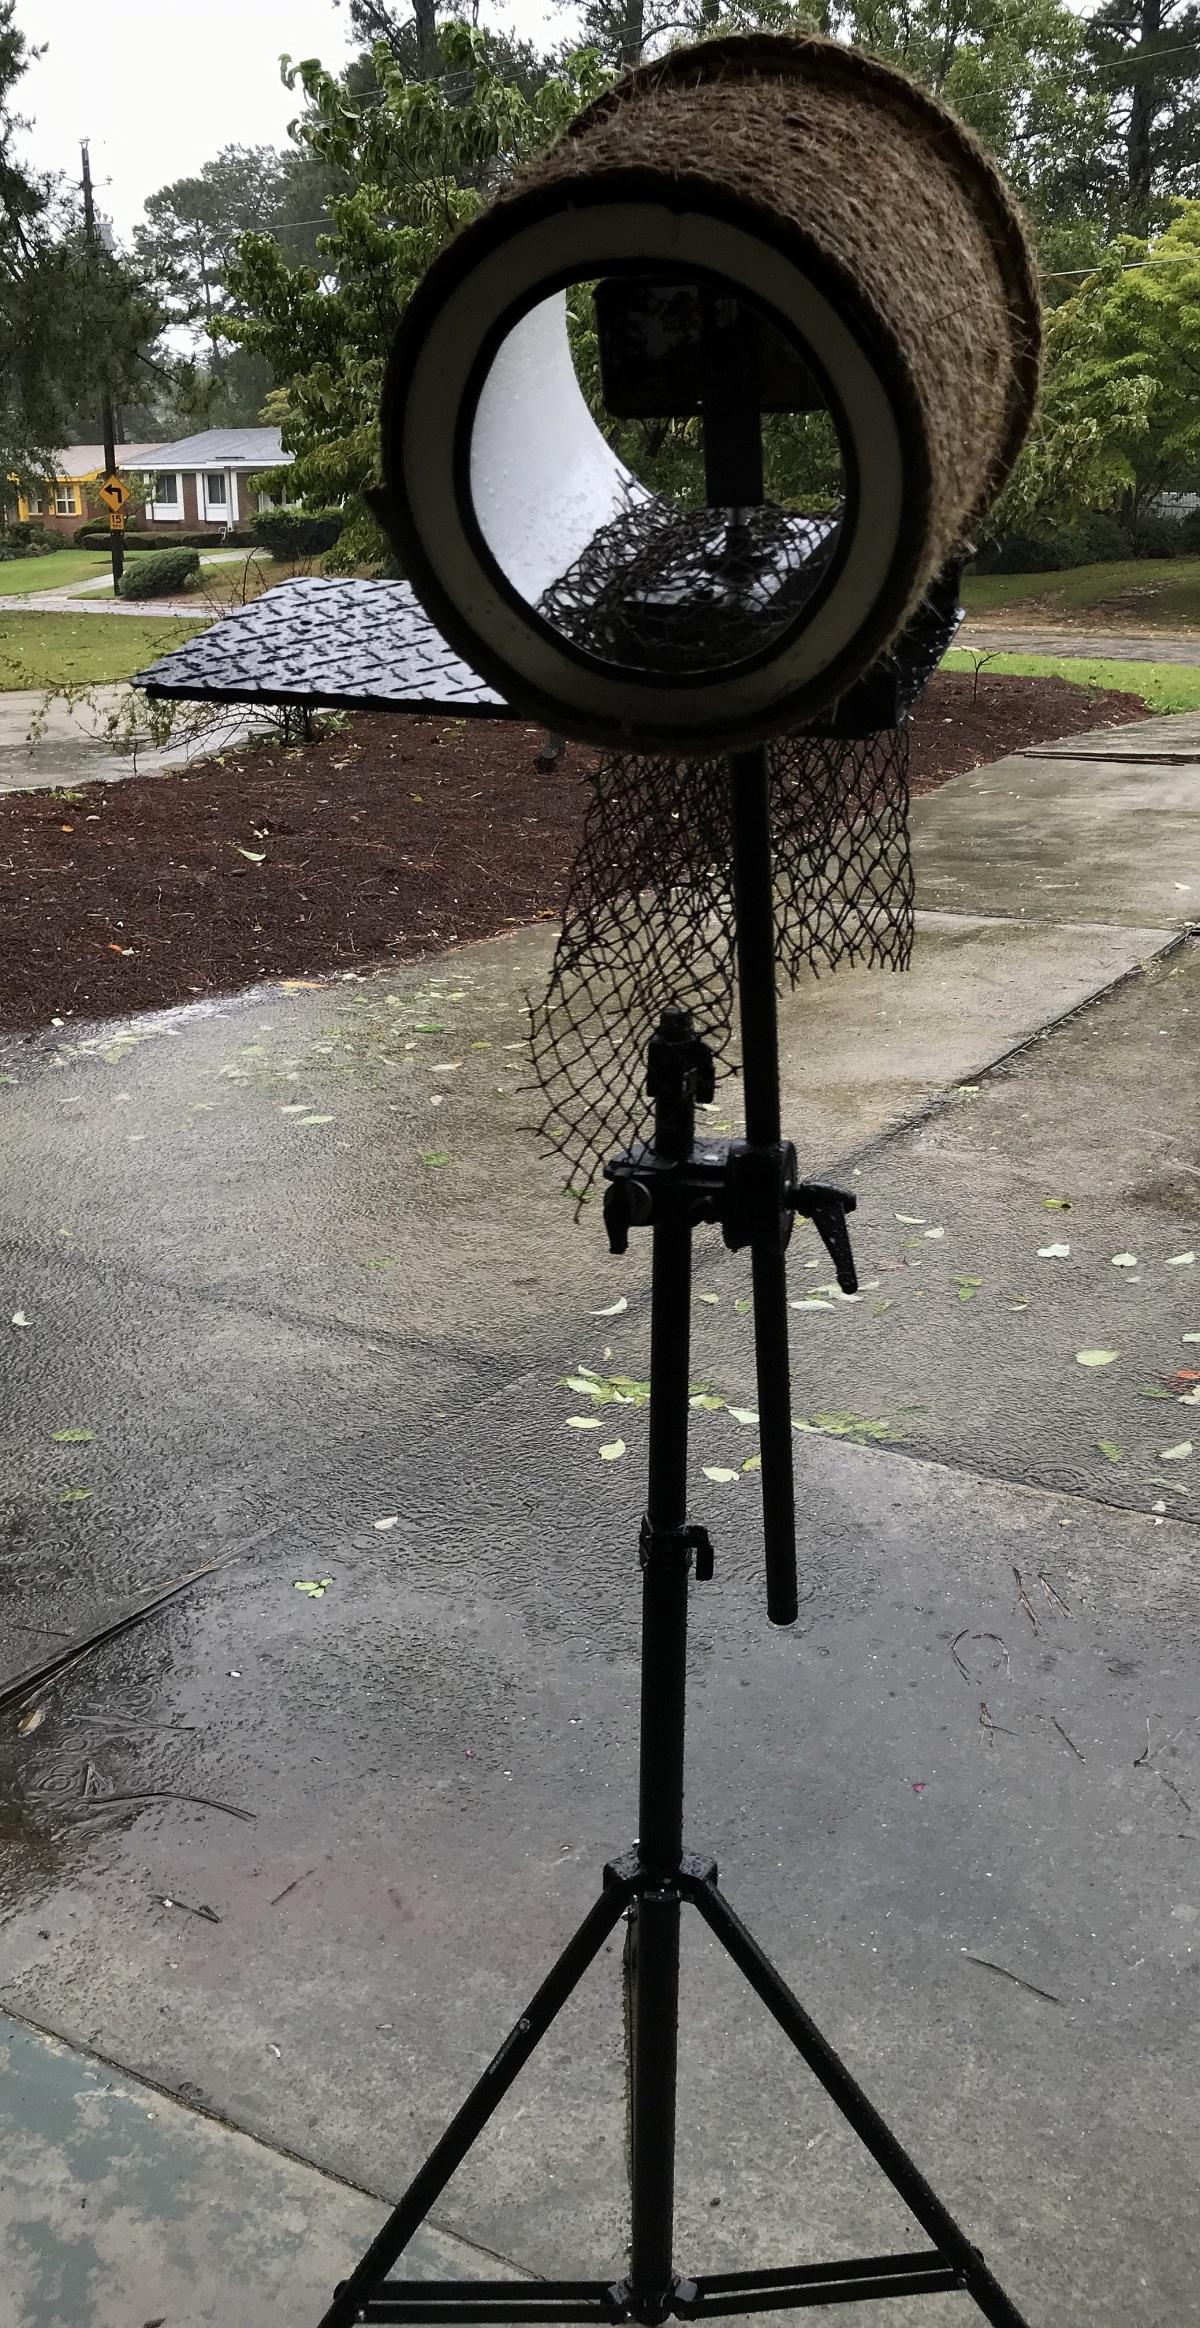 DIY ~ Smartphone Rain Cover,09/14